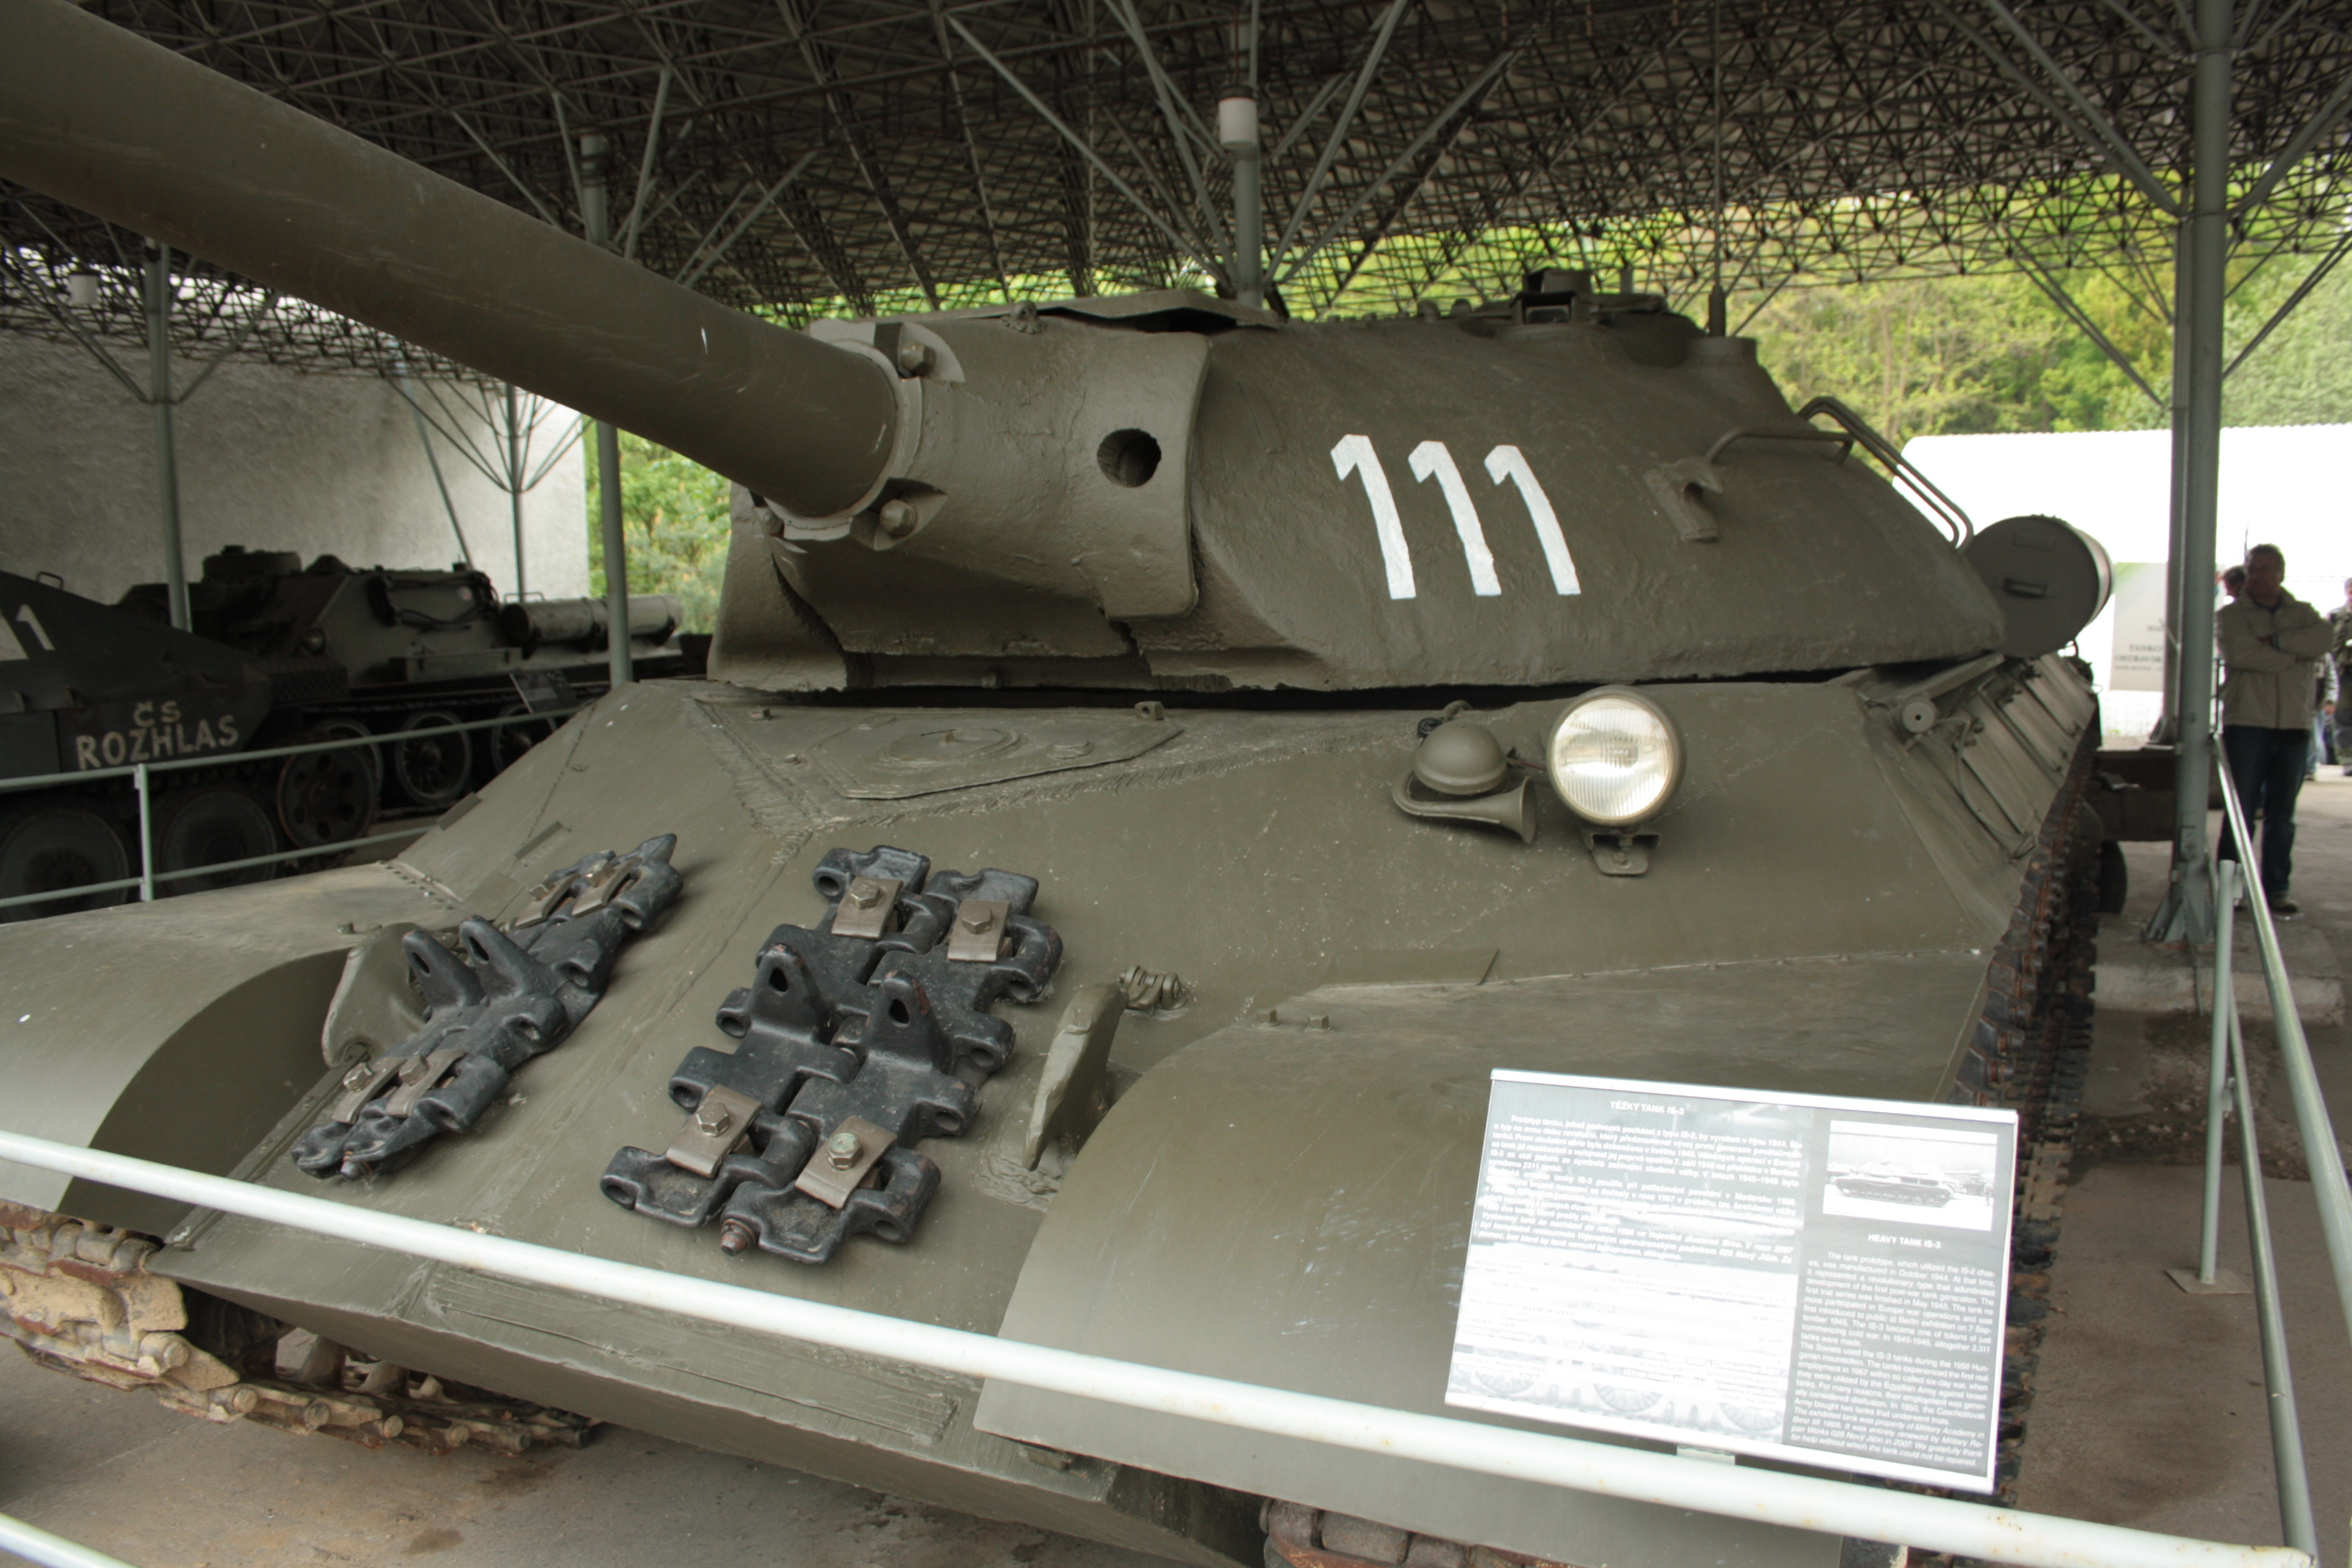 file le any vojensk muzeum t k tank is 3 jpg wikimedia commons. Black Bedroom Furniture Sets. Home Design Ideas